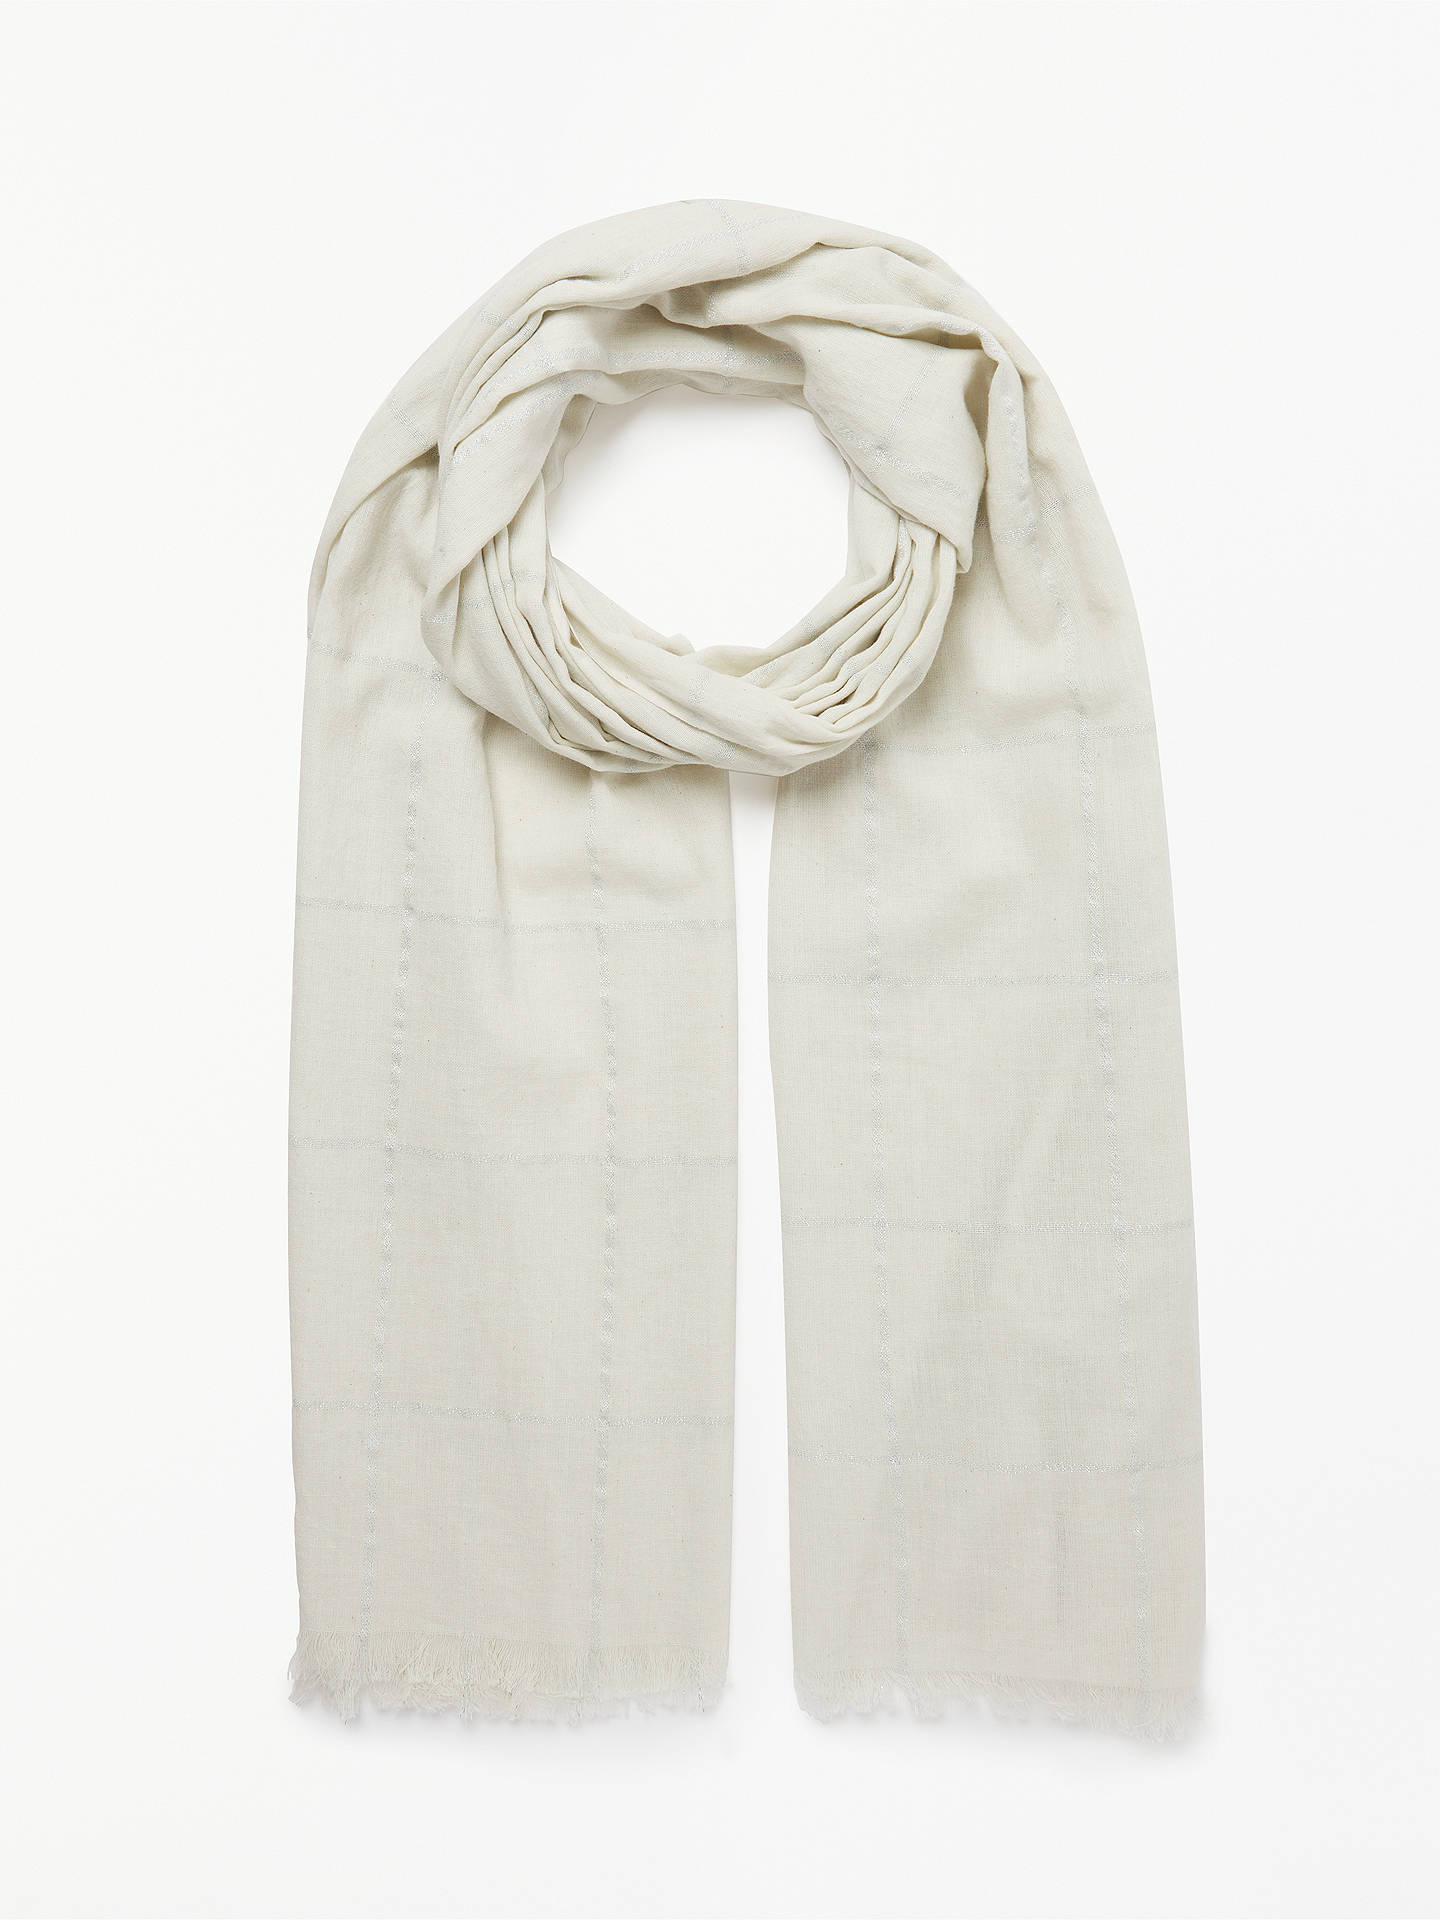 7b223c608445b Buy Unmade Rosa Metallic Check Cotton Scarf, Paste Blue Online at  johnlewis.com ...